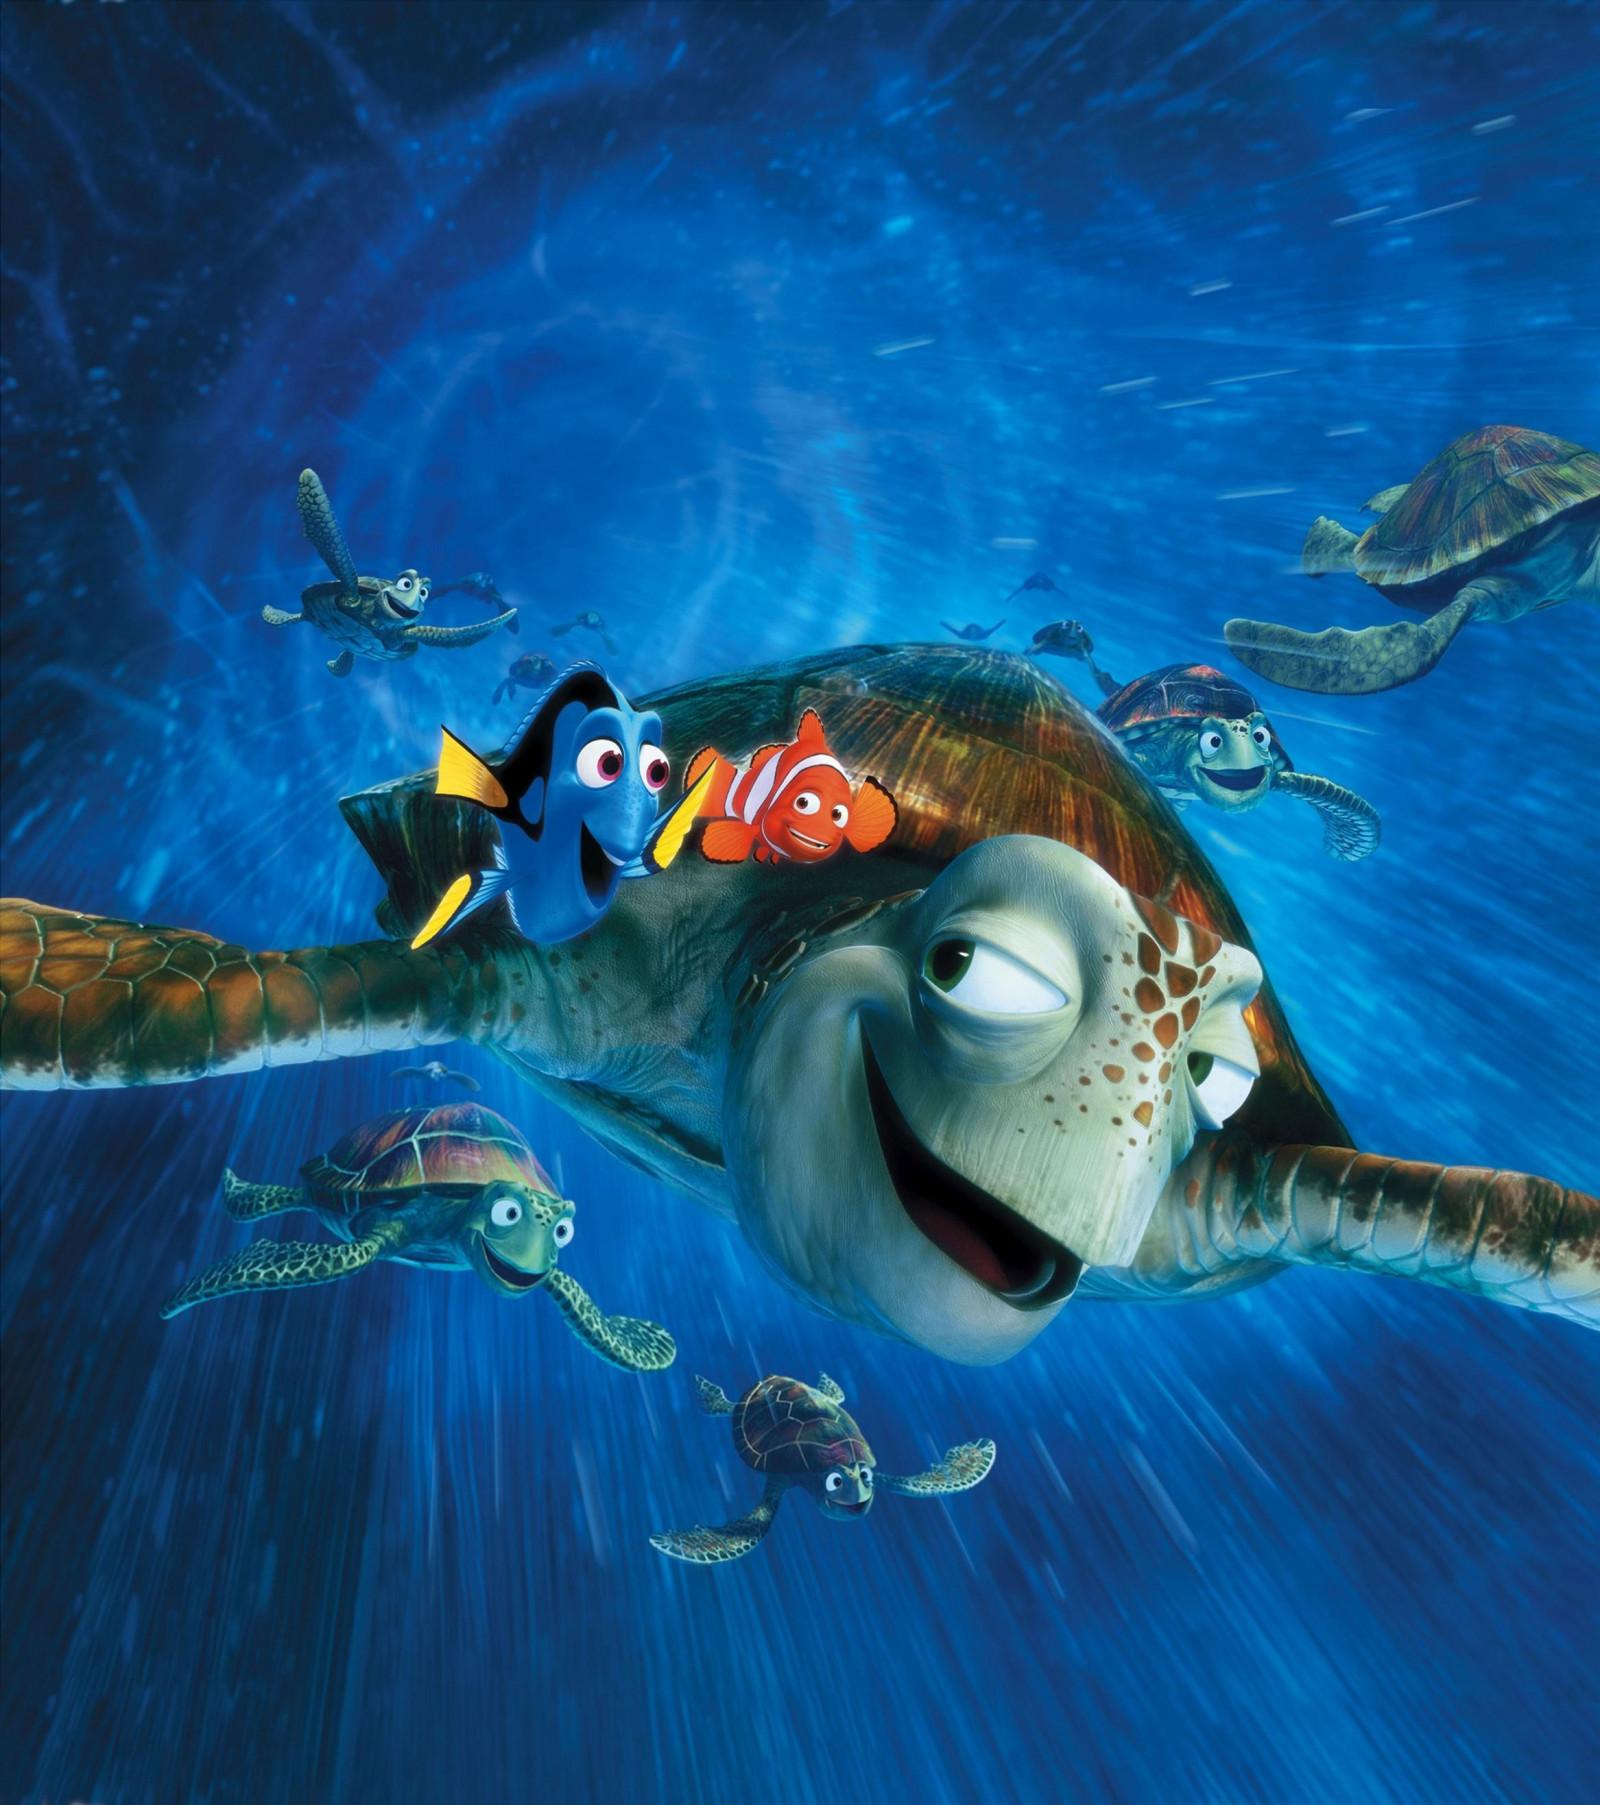 Wallpaper Movies Underwater Disney Finding Nemo